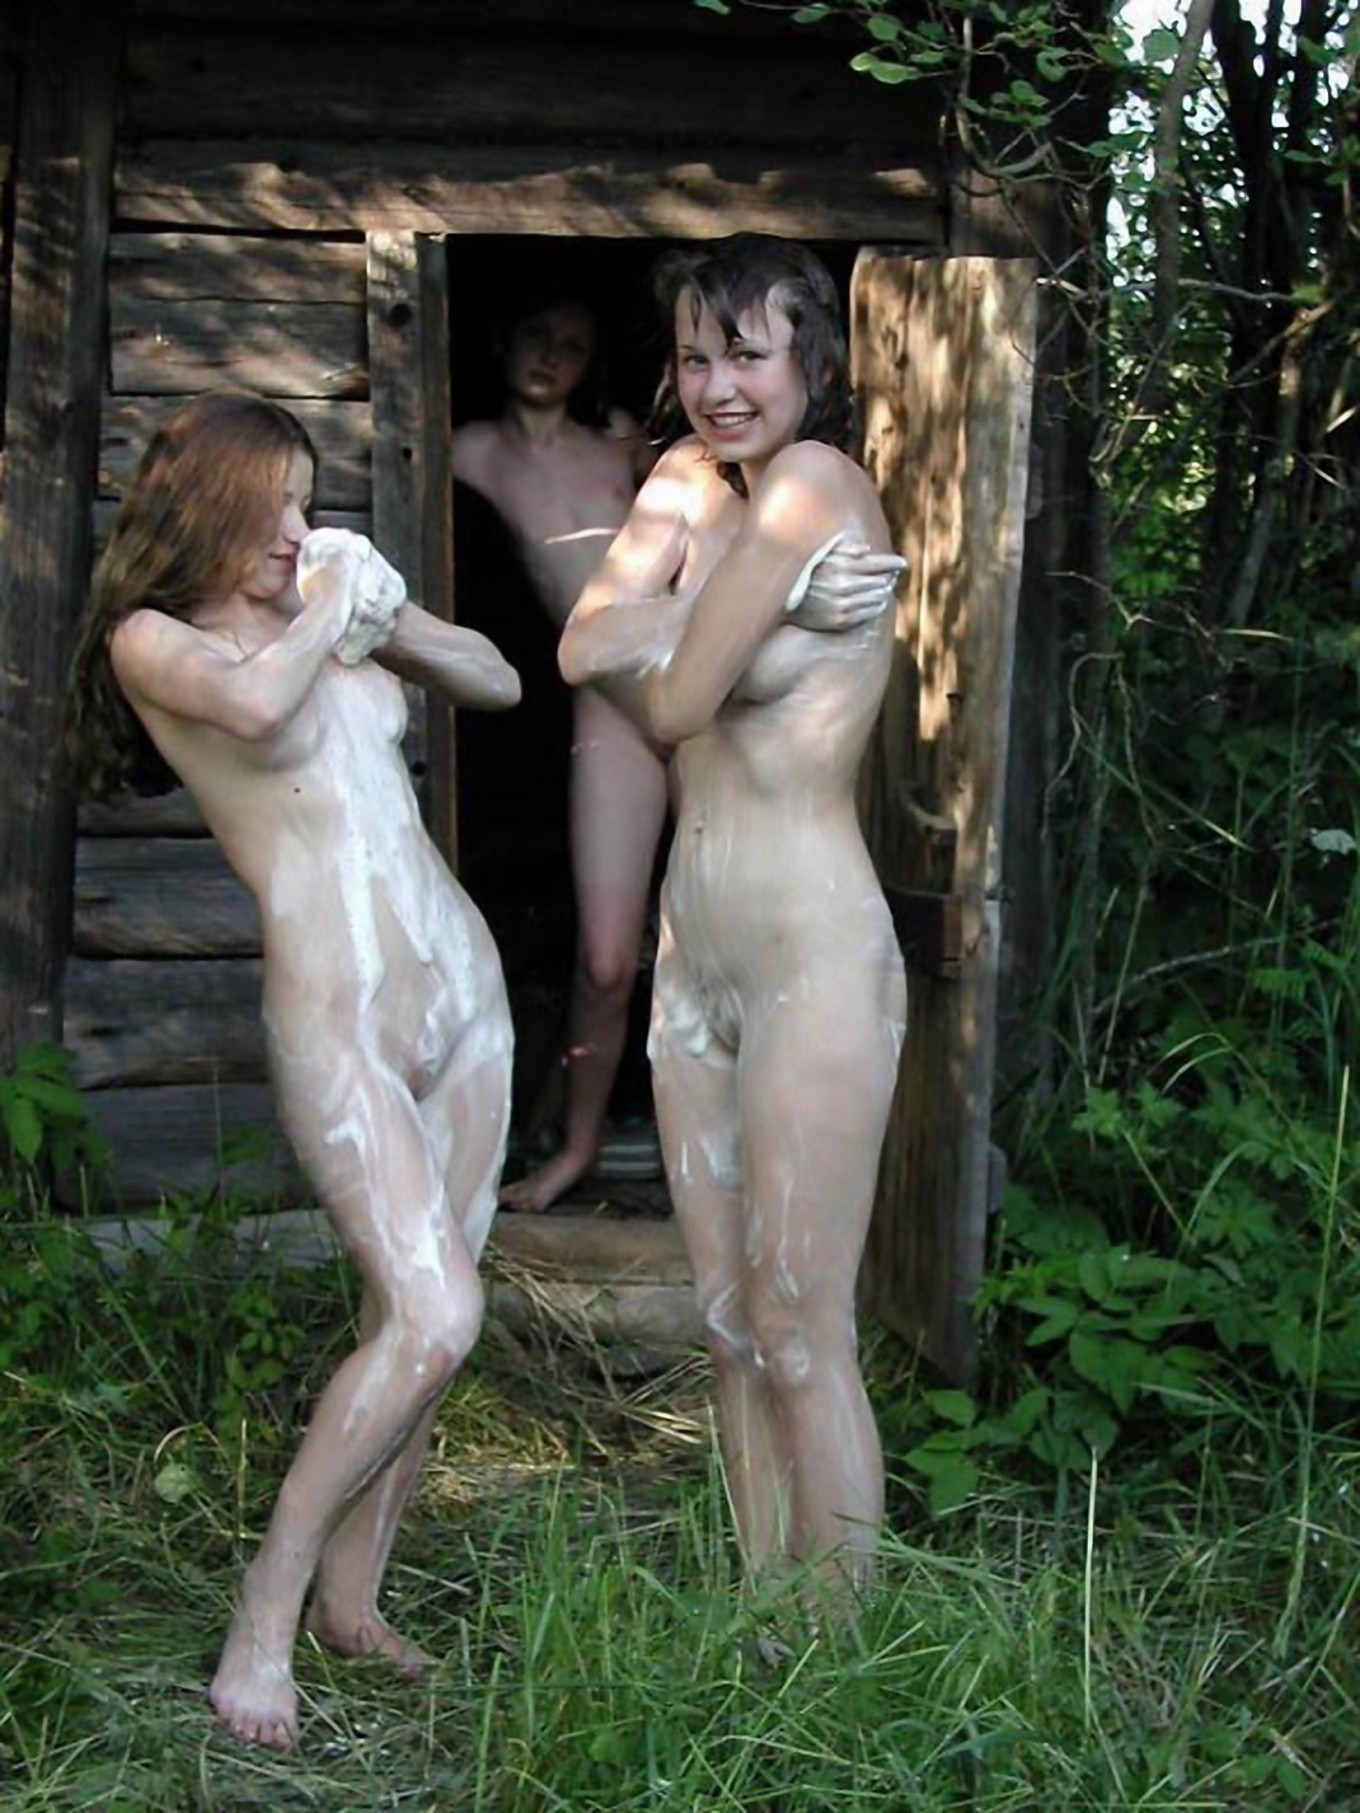 Фото девушки моются в бани 12 фотография